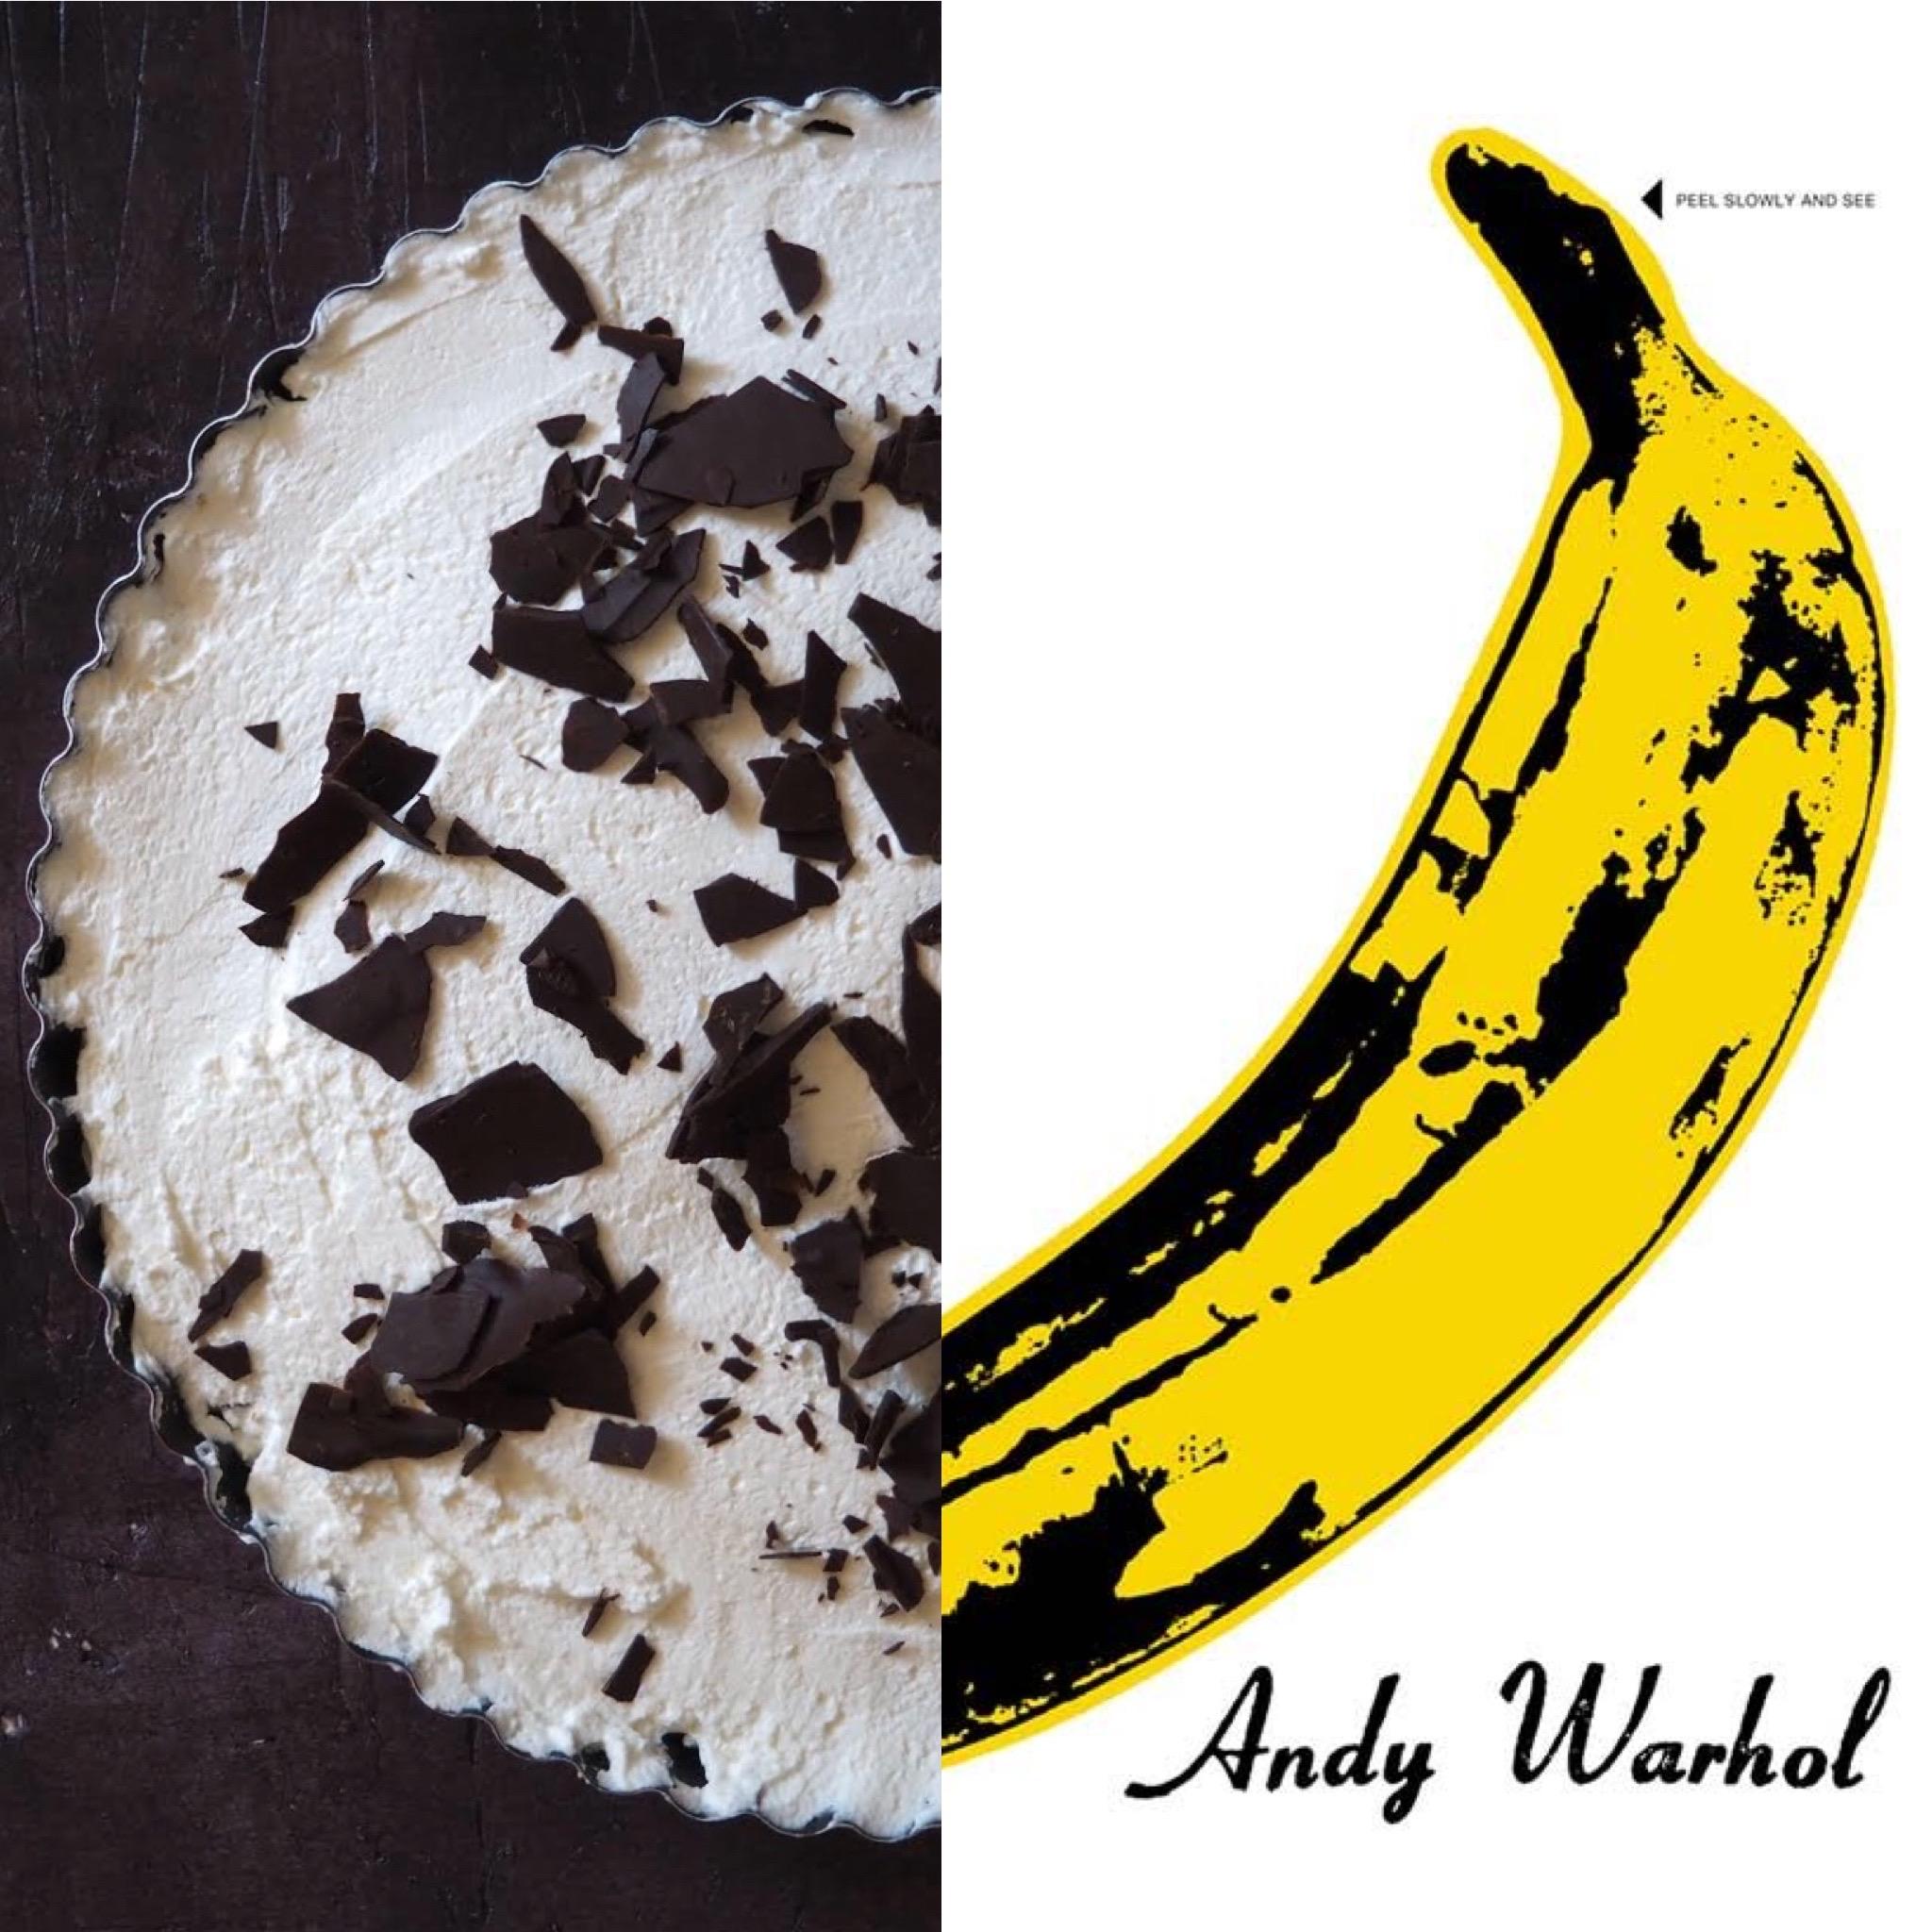 Menú Andy Warhol (II): Pastís Banoffee (CAT)